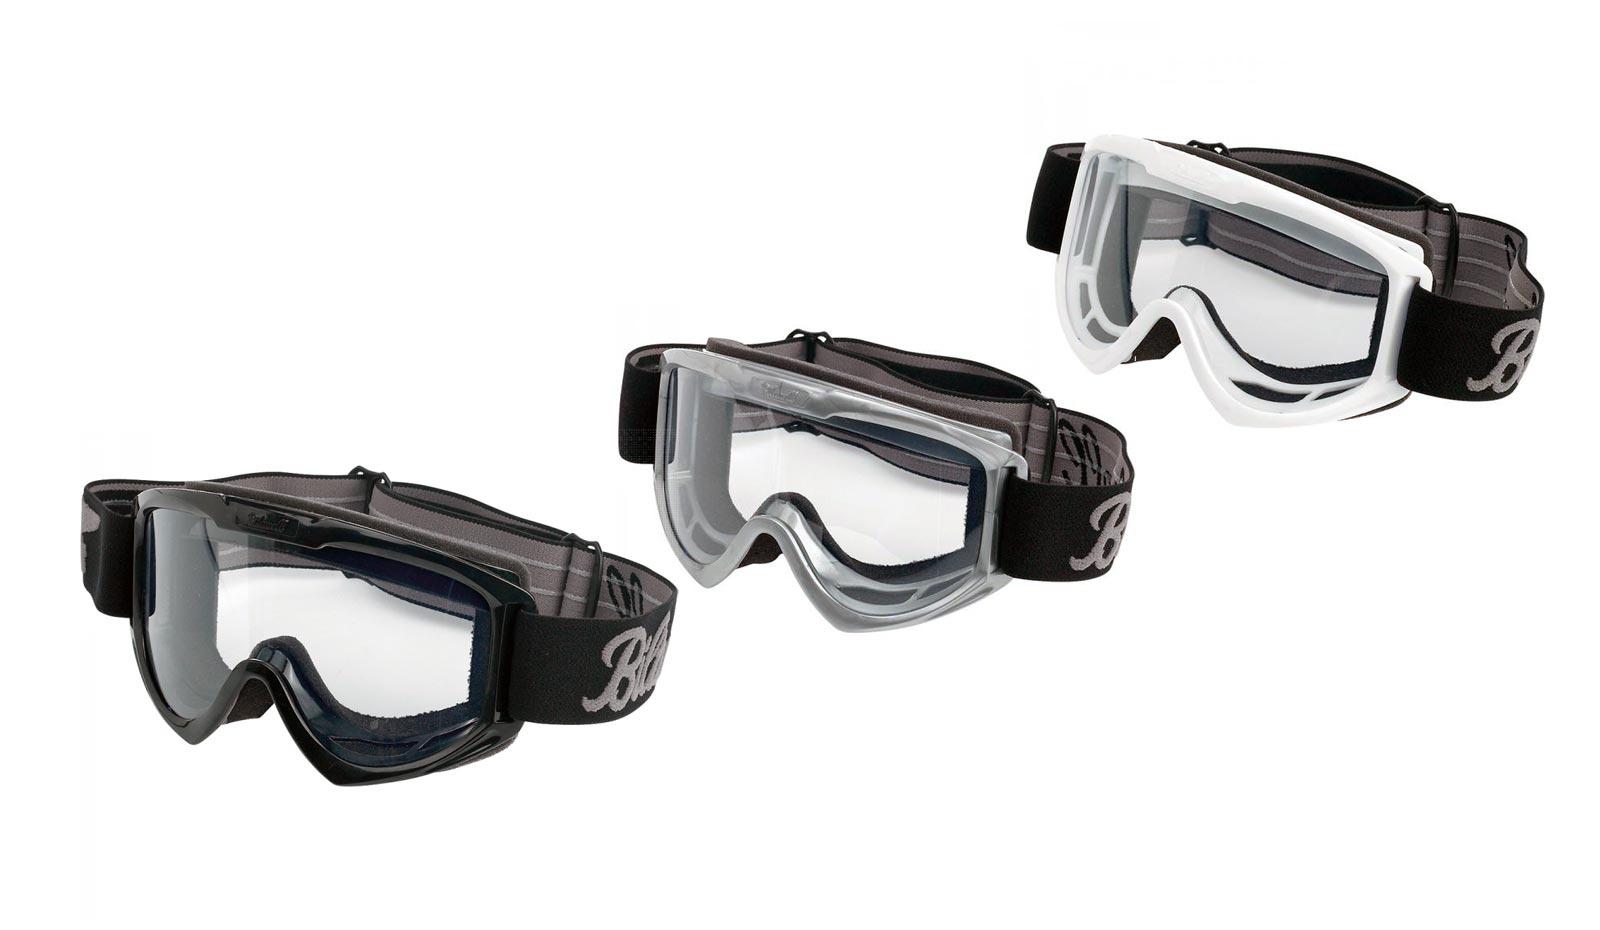 e3f00c049c58 Biltwell Moto Goggles at Thunderbike Shop